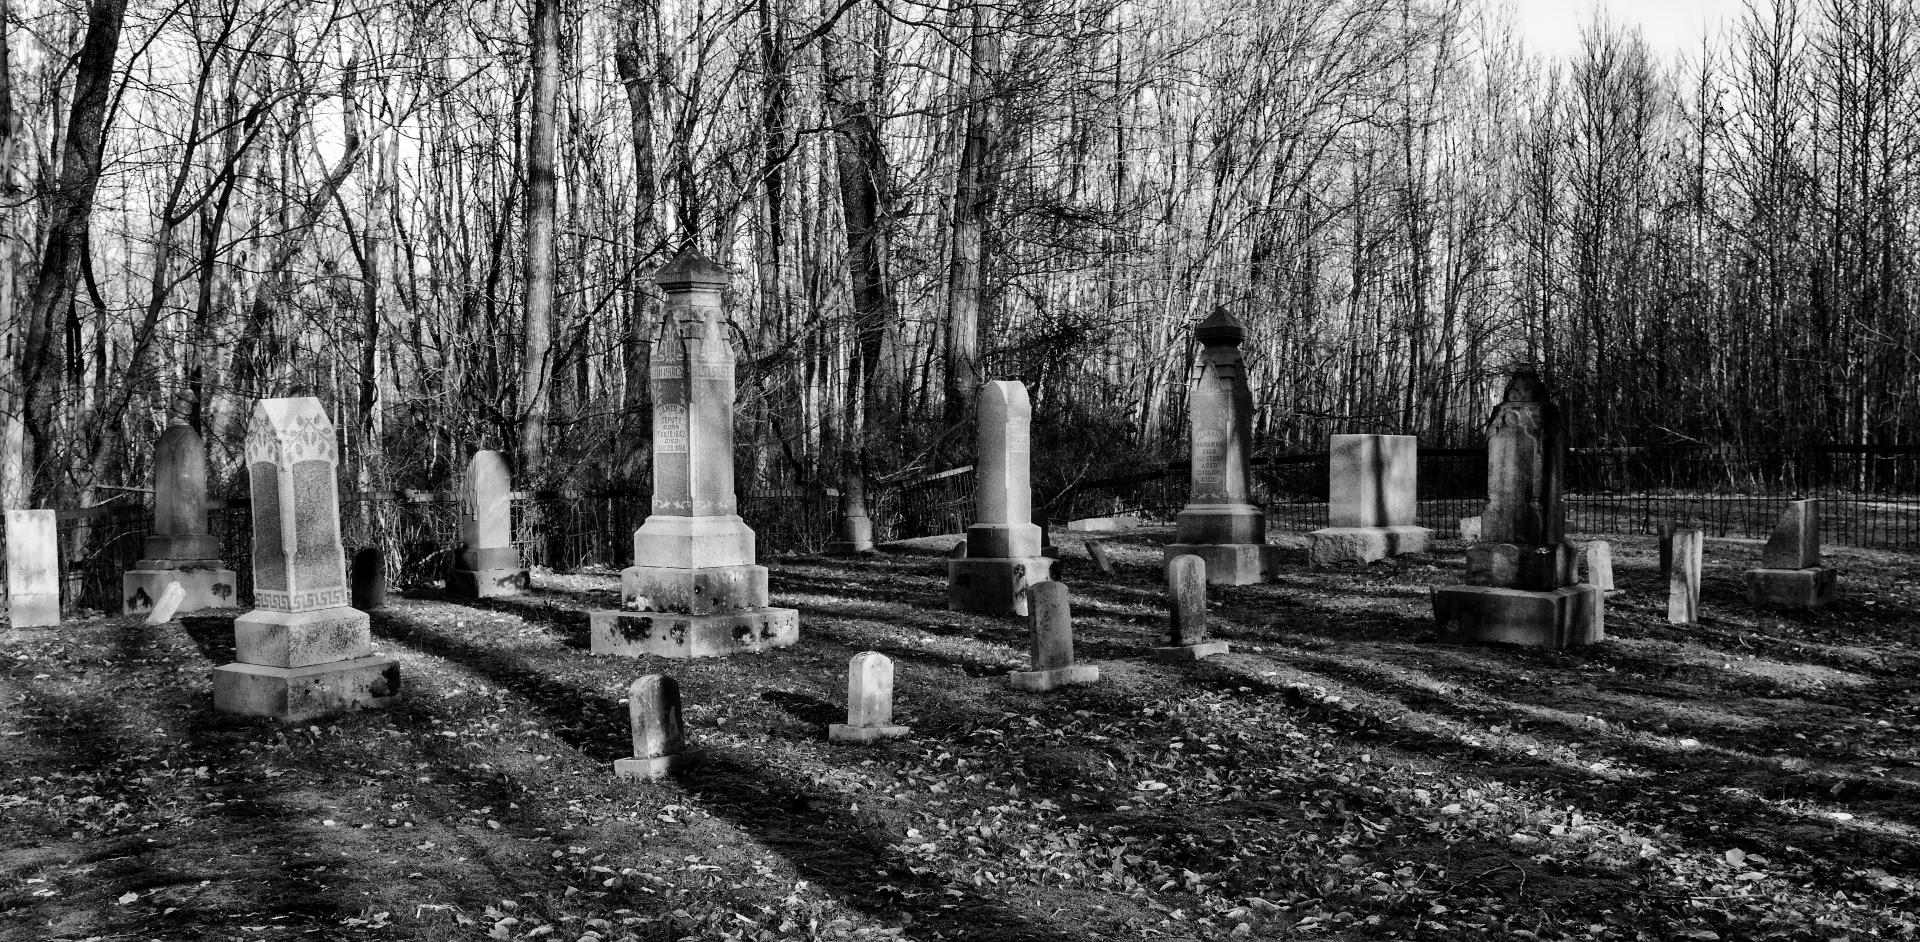 https://i1.wp.com/www.publicdomainpictures.net/pictures/210000/velka/barkman-cemetery.jpg